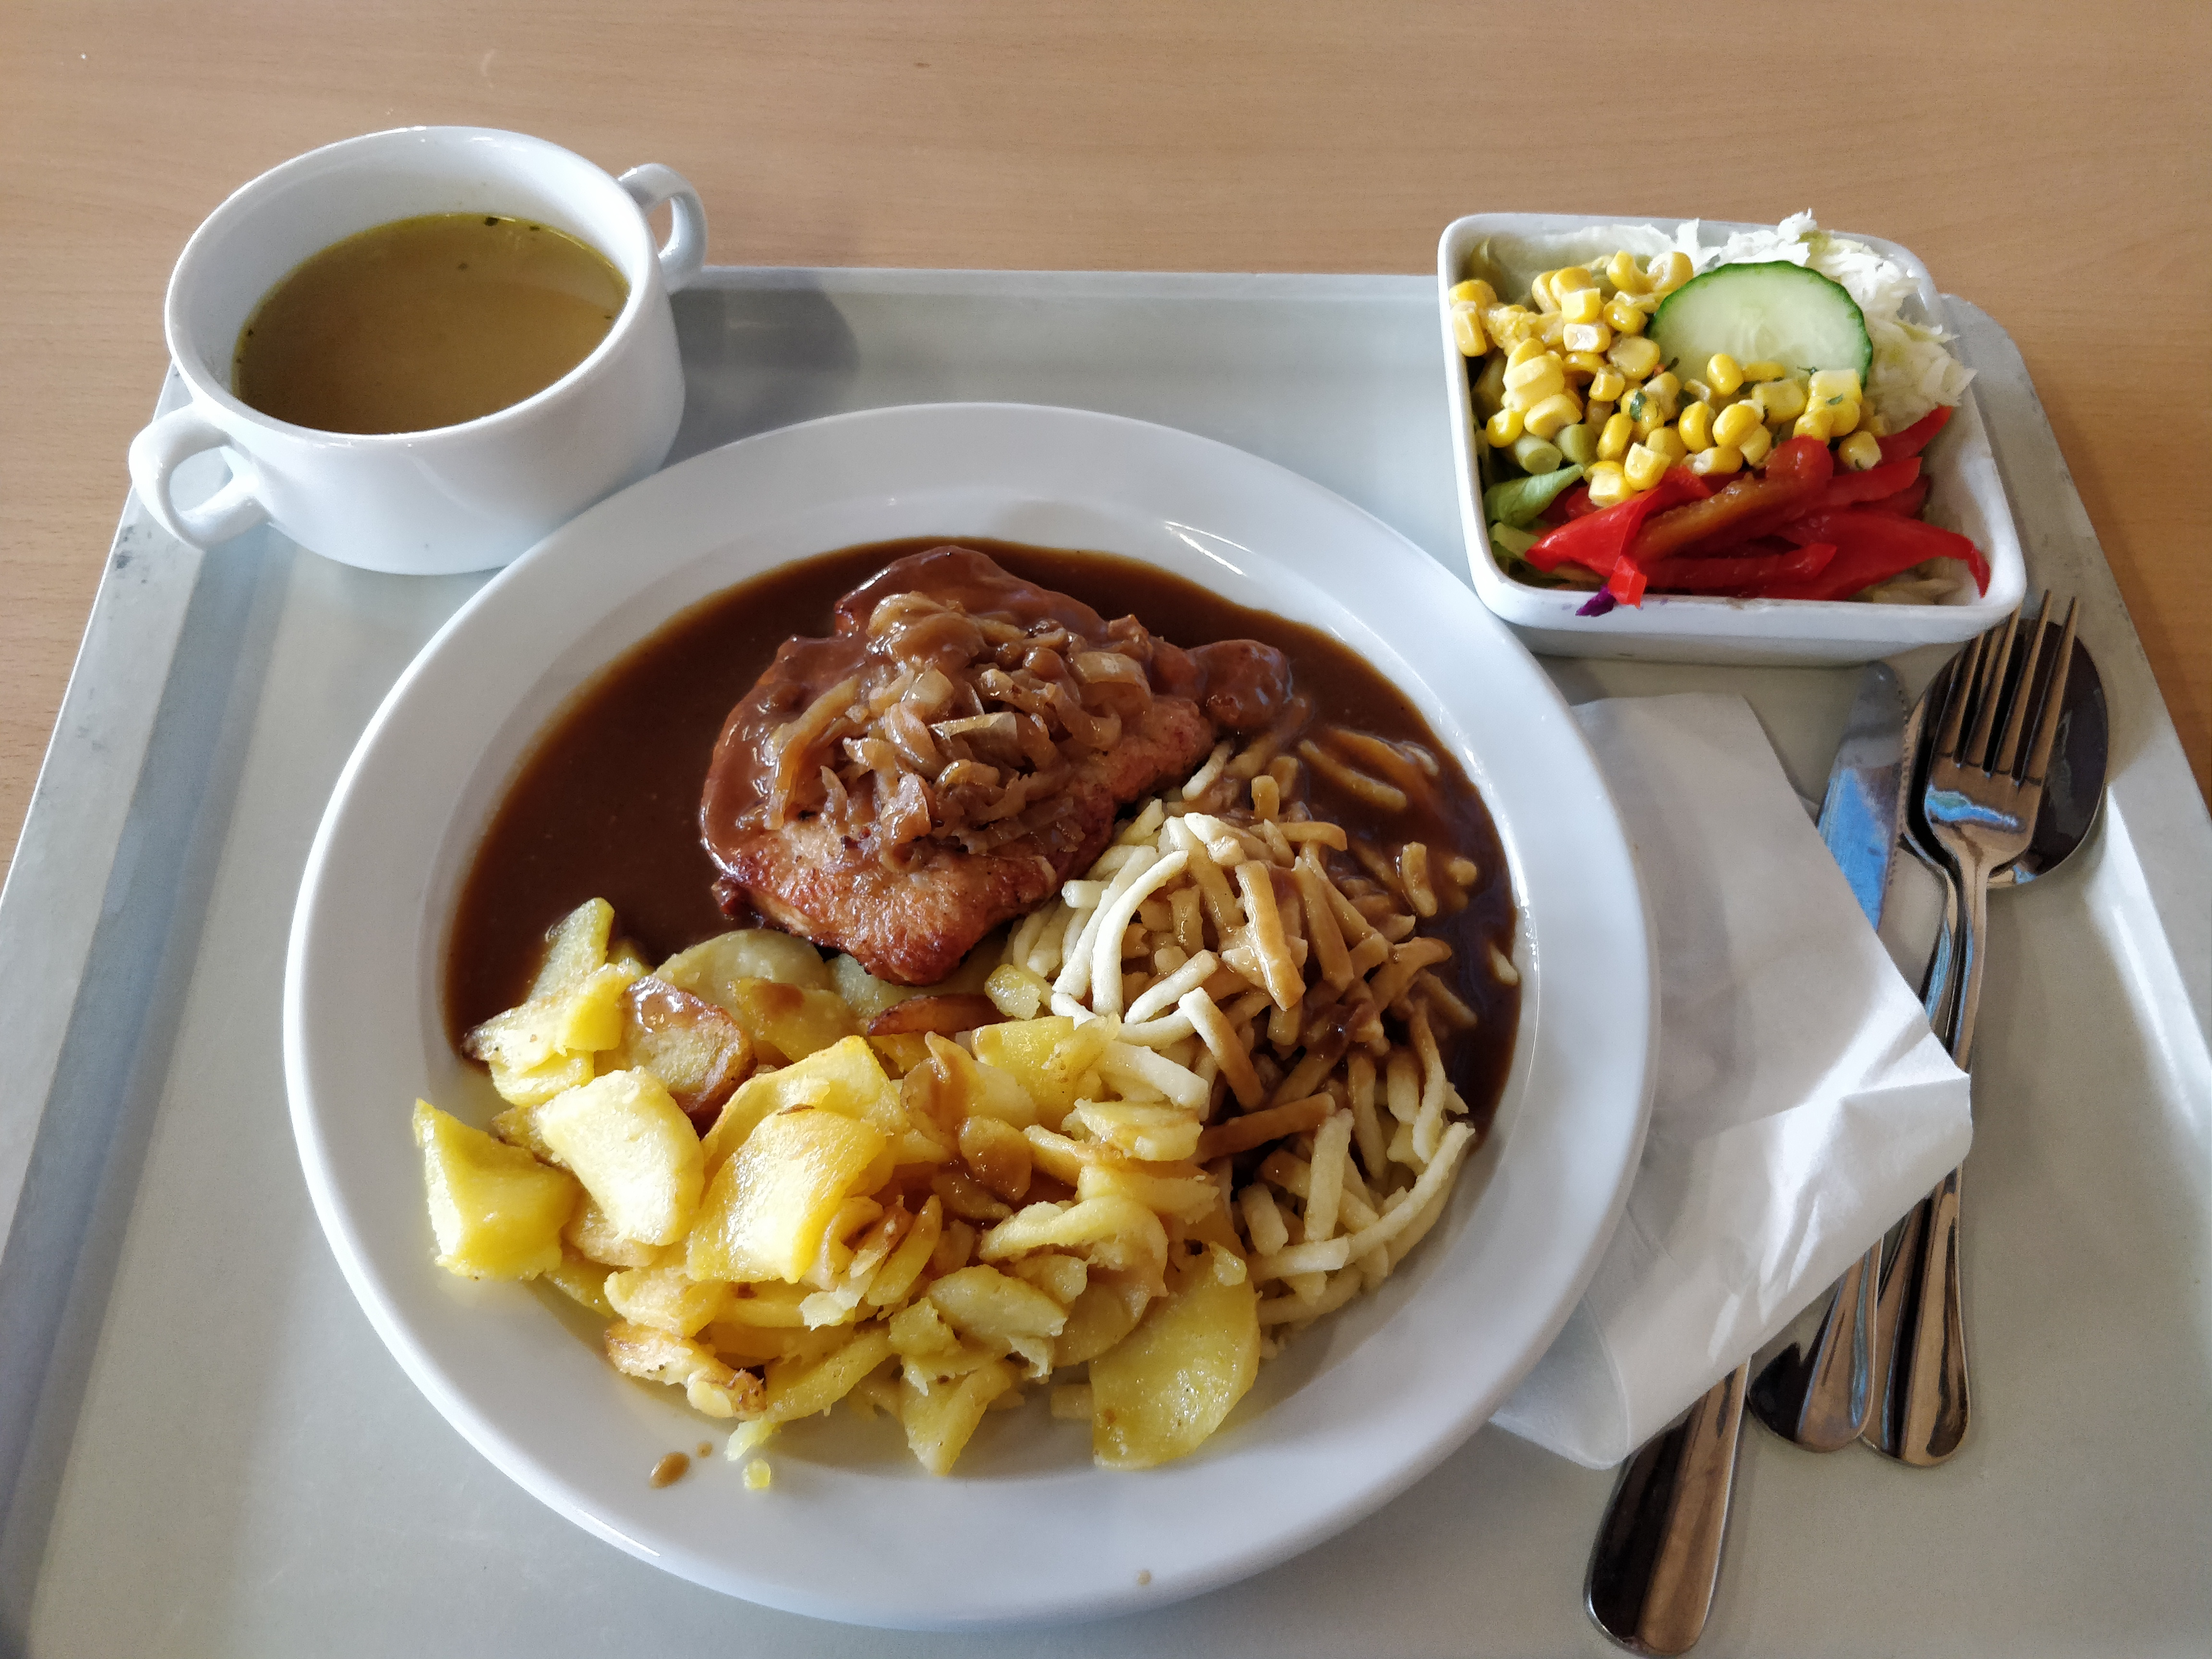 https://foodloader.net/nico_2018-12-05_zwiebelrostbraten-bratkartoffeln-spaetzle-suppe-salat.jpg